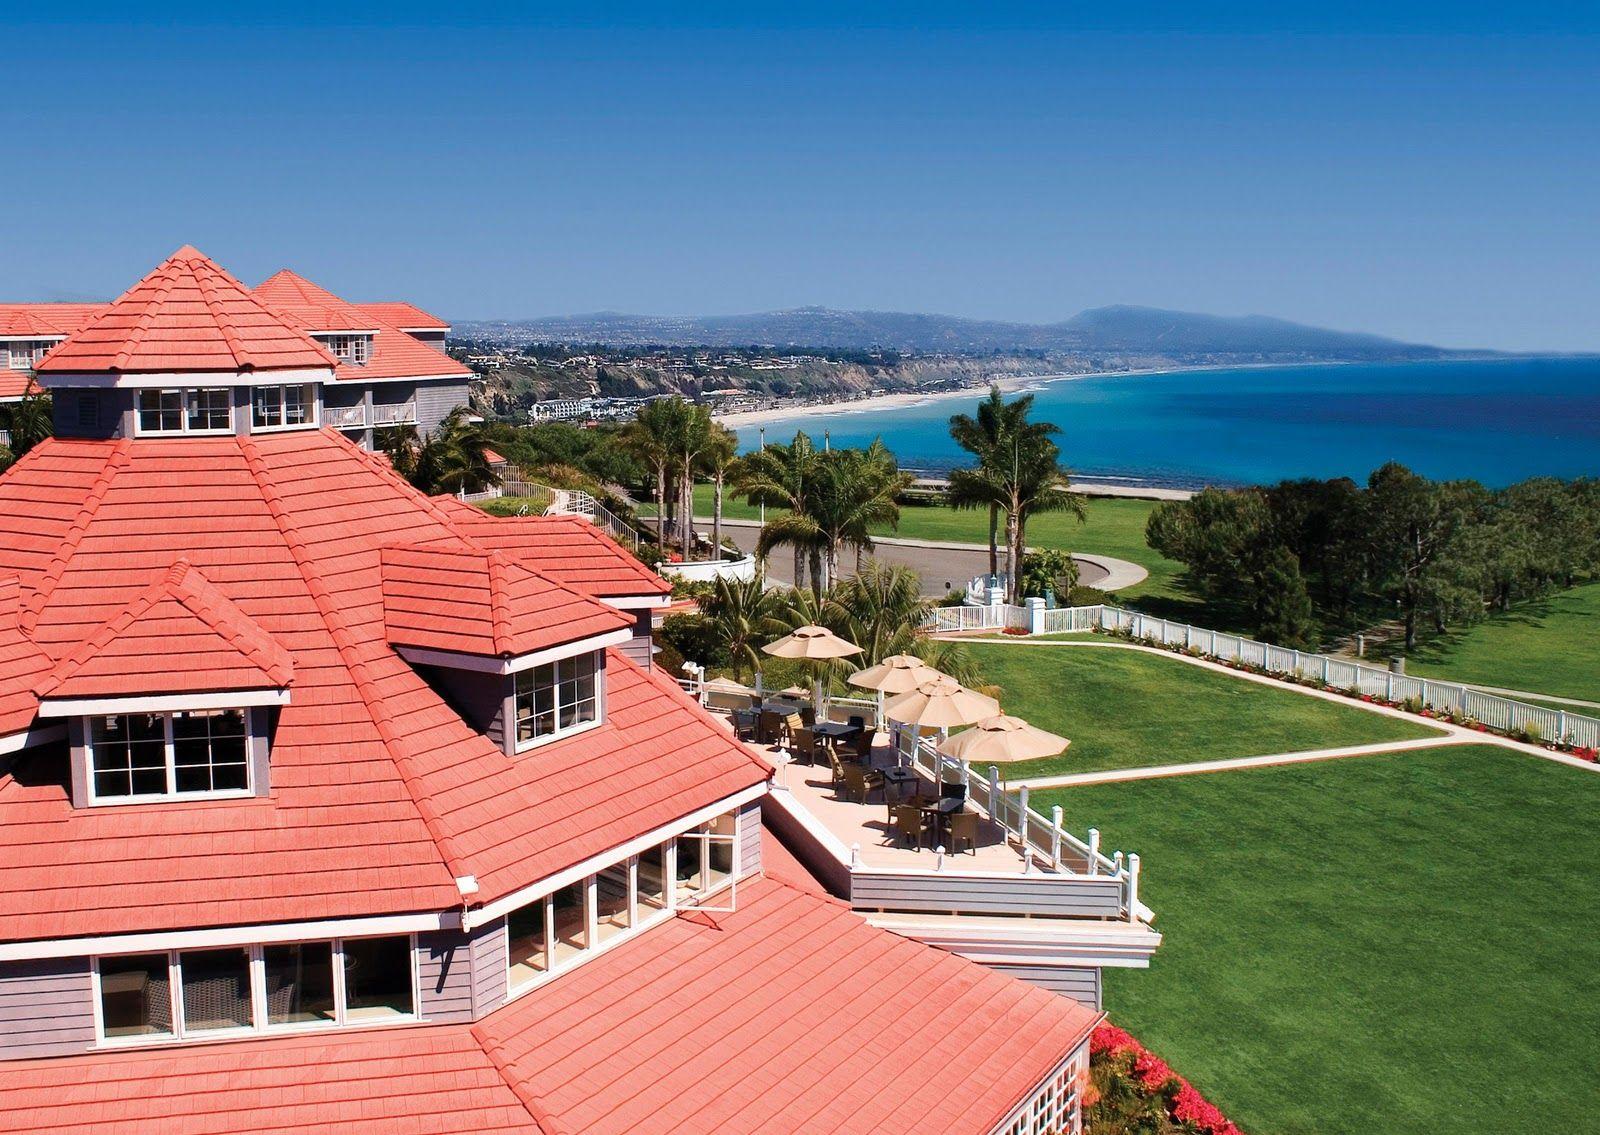 marriott laguna cliffs resort and spa dana point luxury. Black Bedroom Furniture Sets. Home Design Ideas